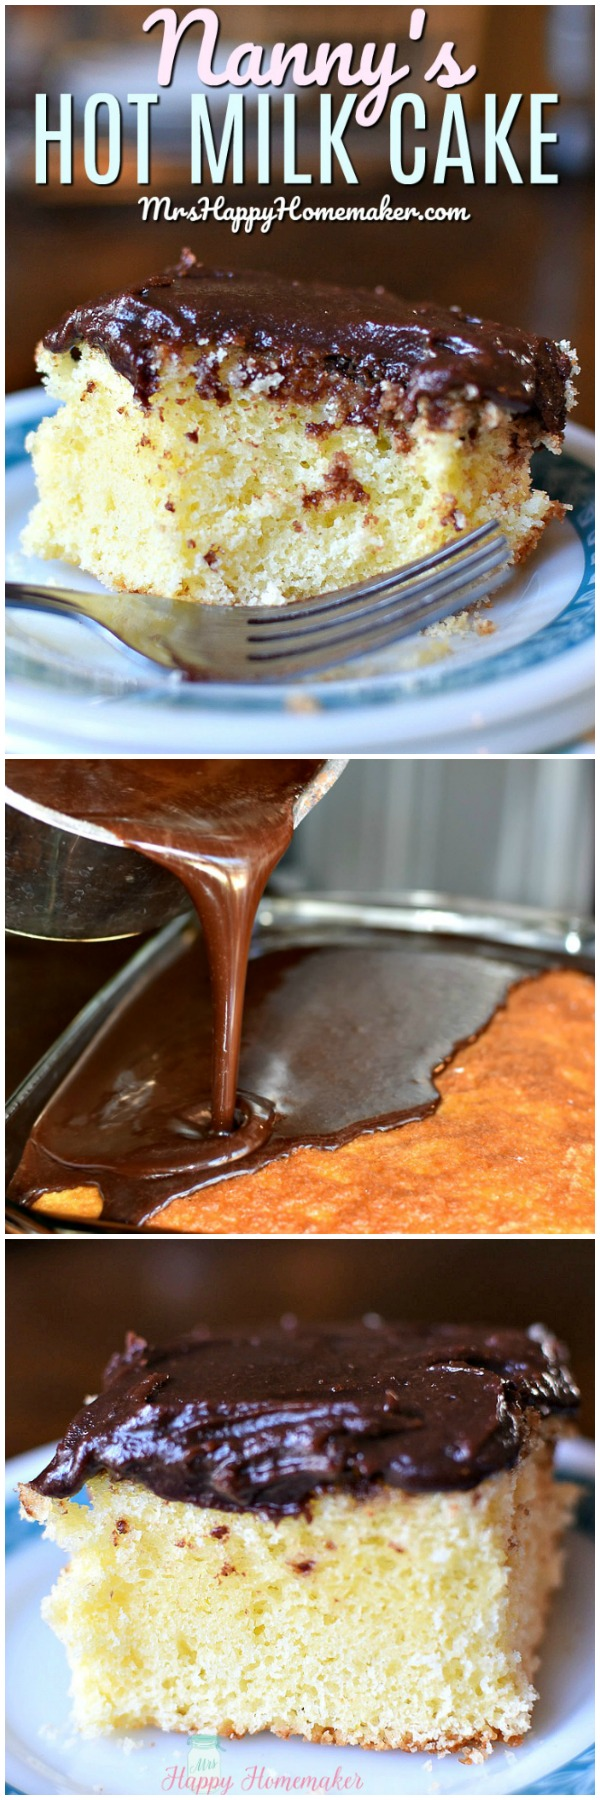 NANNIE'S HOT MILK CAKE